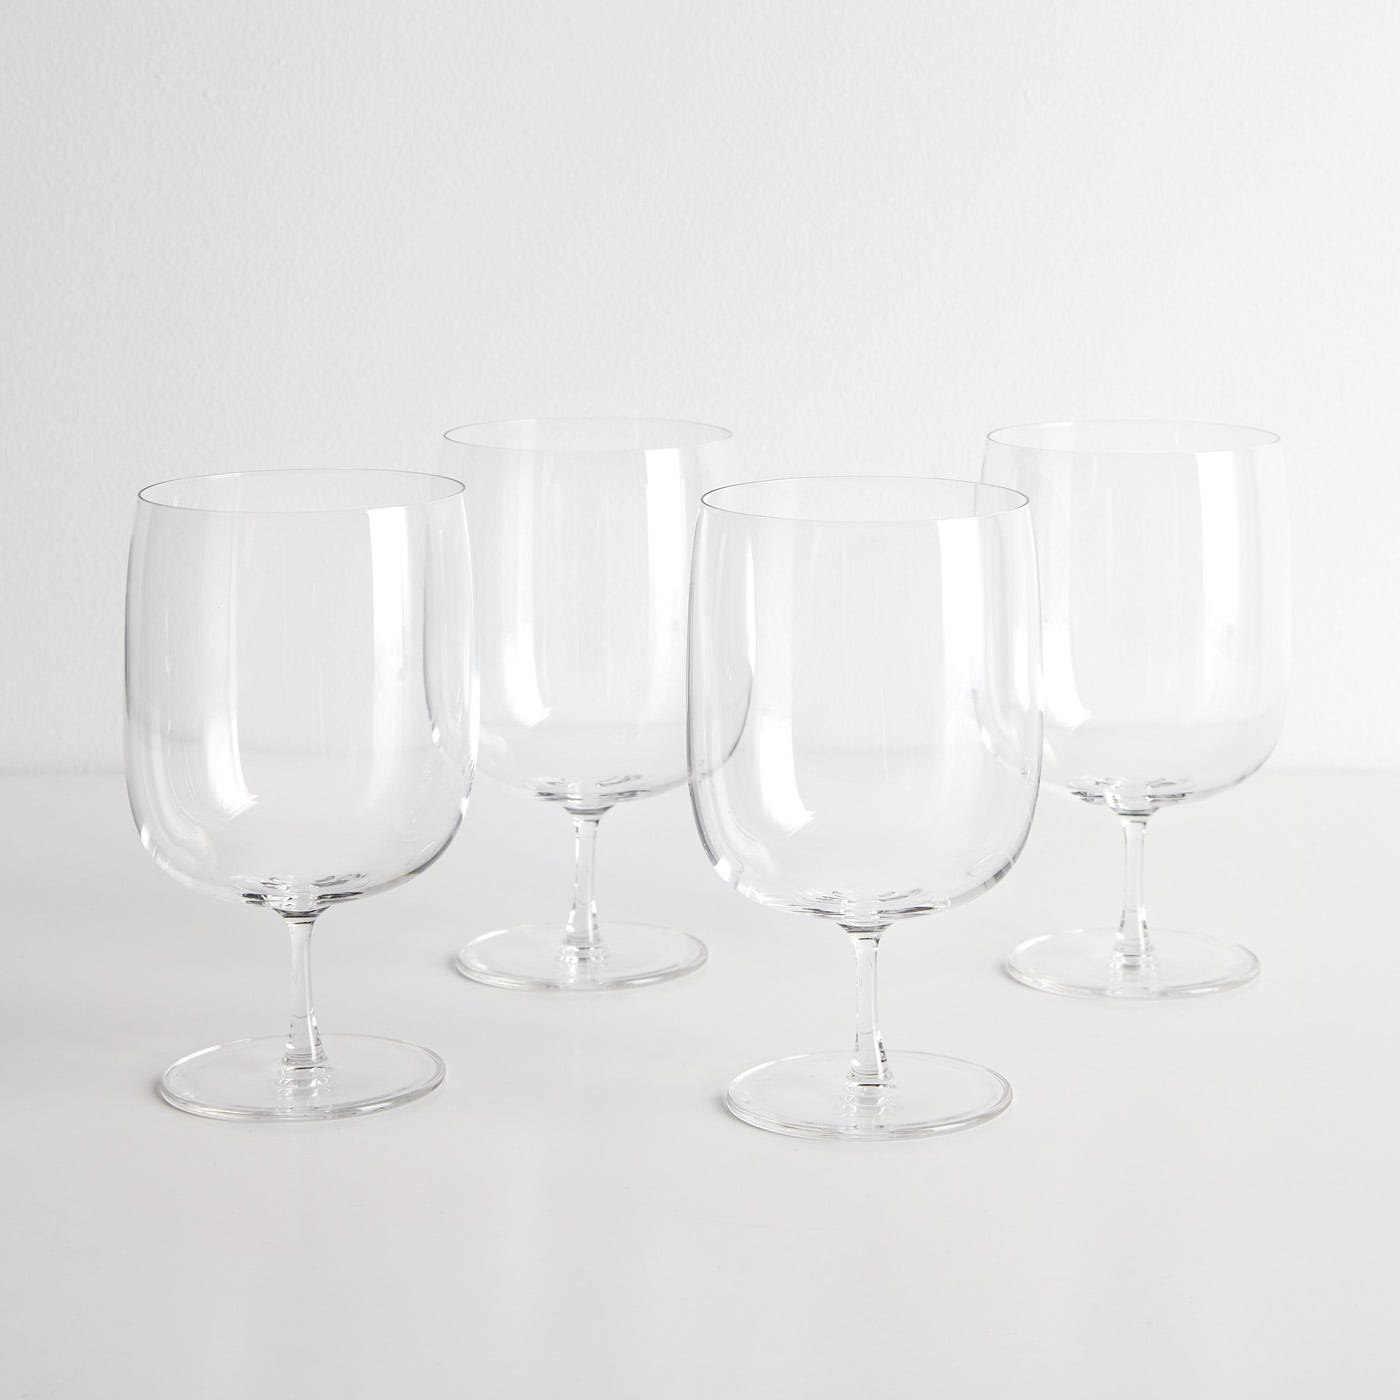 LSA Borough Craft Beer Glasses Set of 4